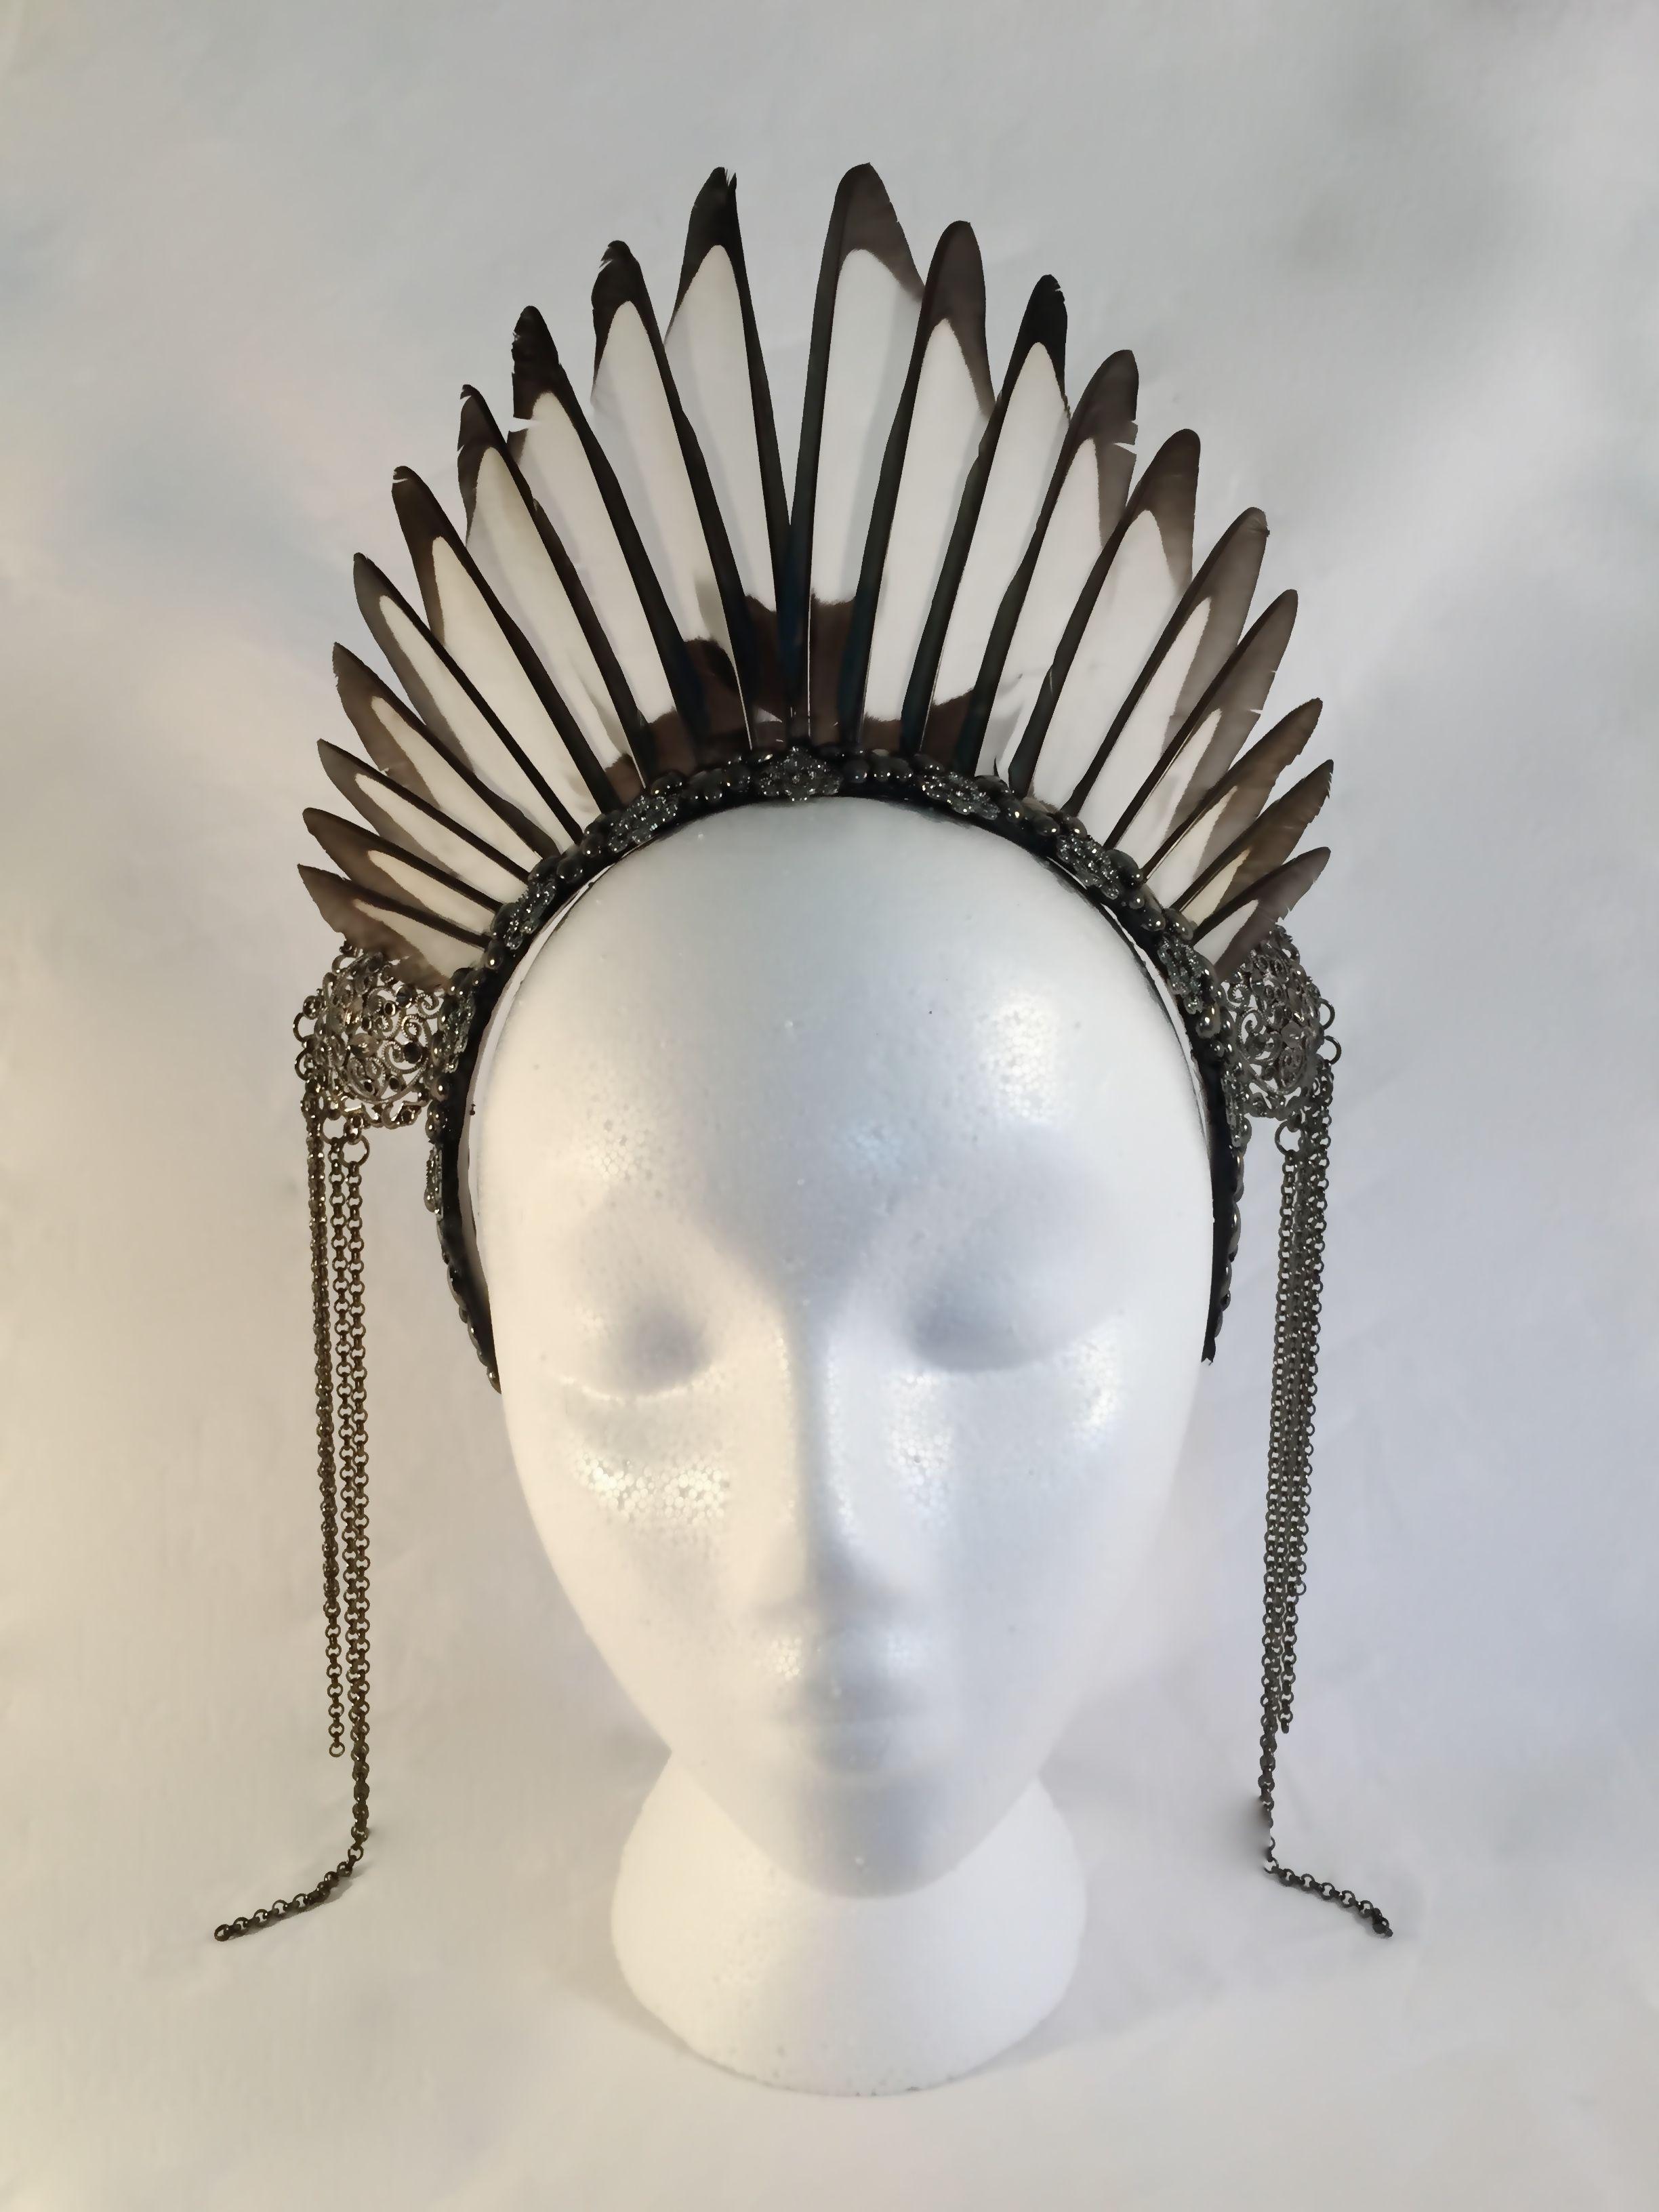 #maeve headpiece by #amaroqdesign #amaroq #magpie #halo #crown #feather #smoky #quartz